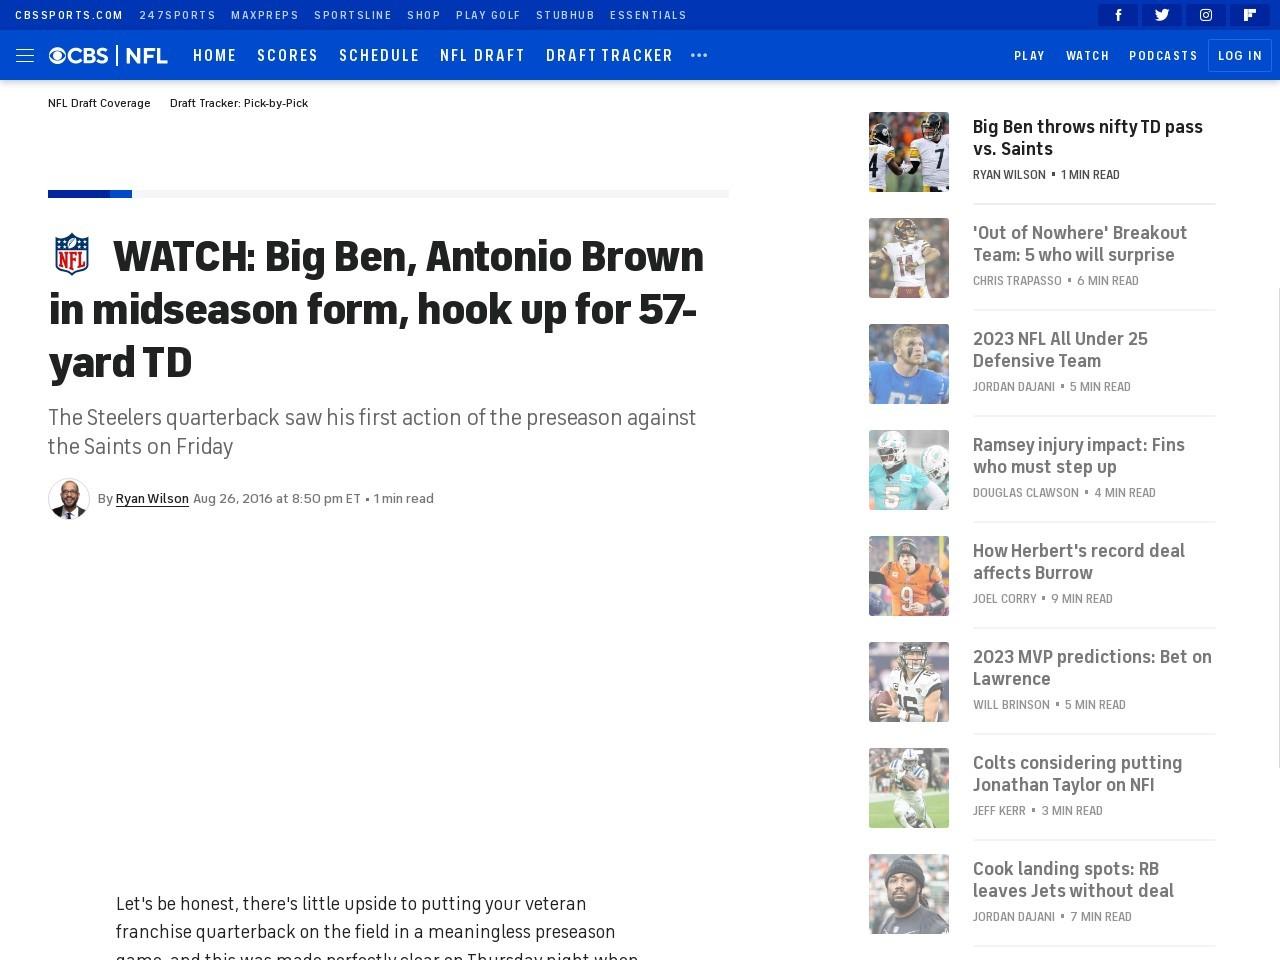 WATCH: Big Ben, Antonio Brown in midseason form, hook up for 57-yard TD